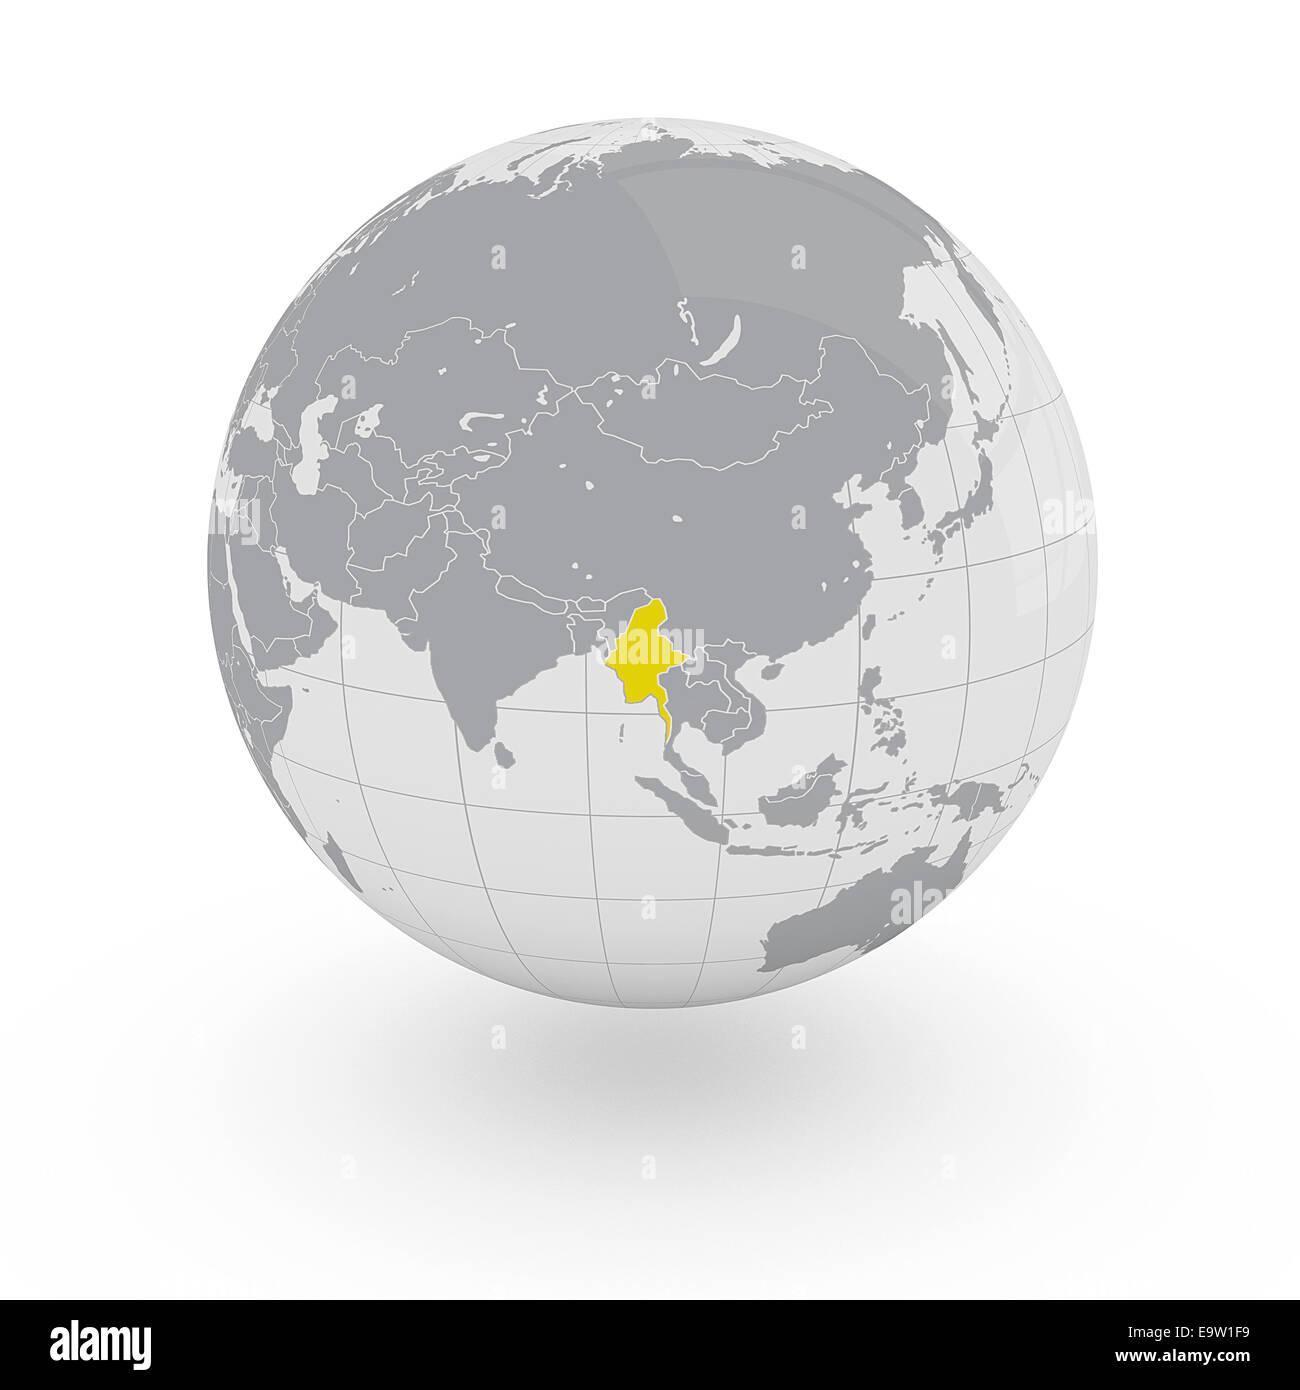 Myanmar on globe isolated on white background Stock Photo